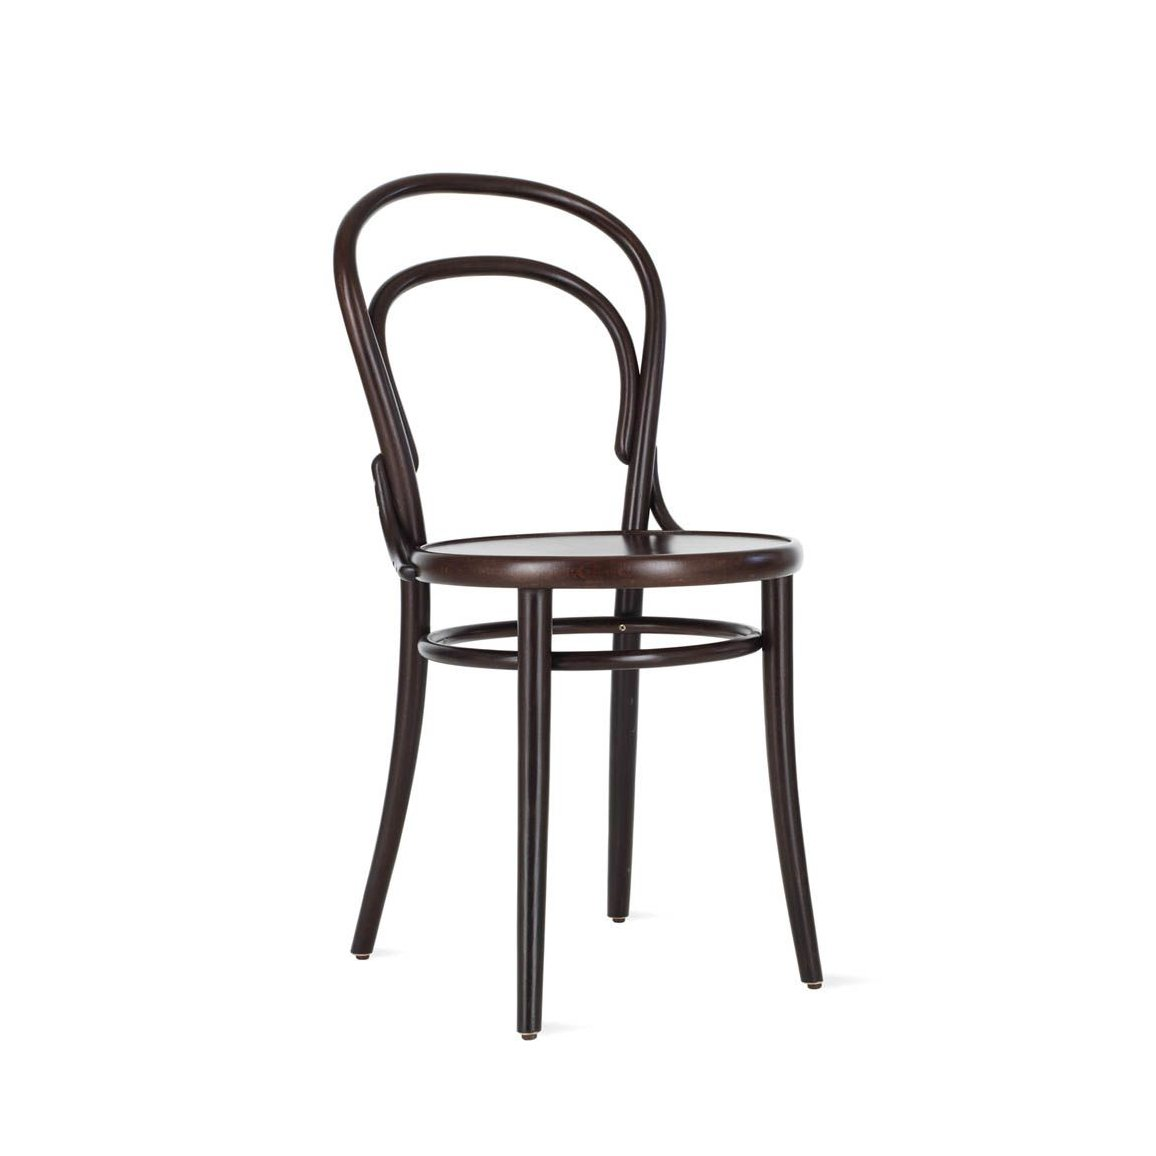 Era (214) Chair, Coffee.